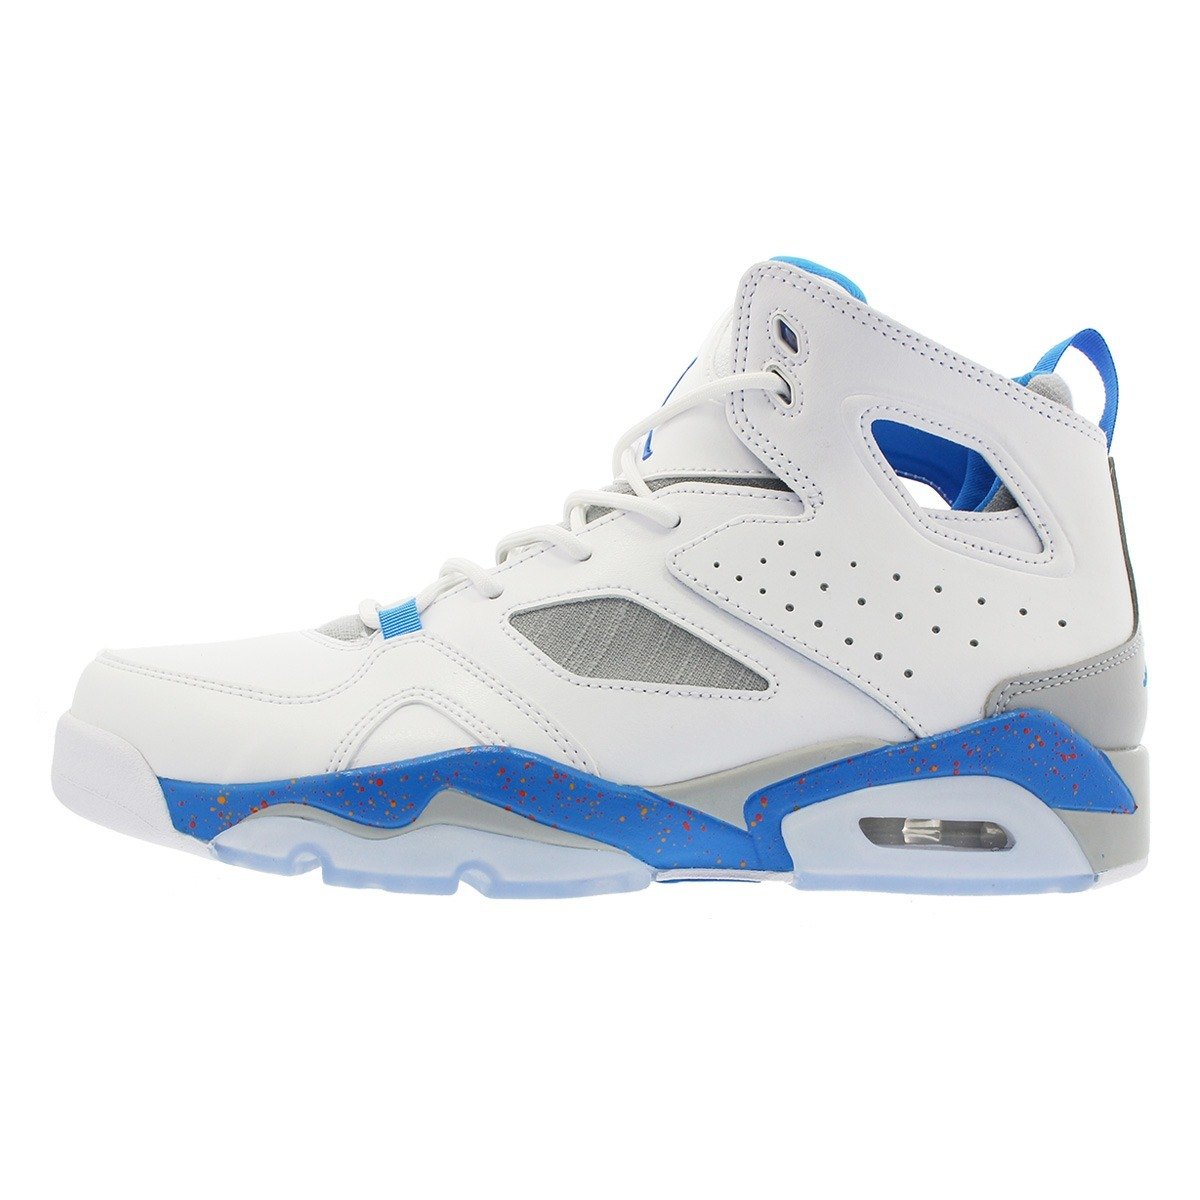 b91a96d18f91 Tenis Nike Air Jordan Flight Club 91 555475-104 Originales ...